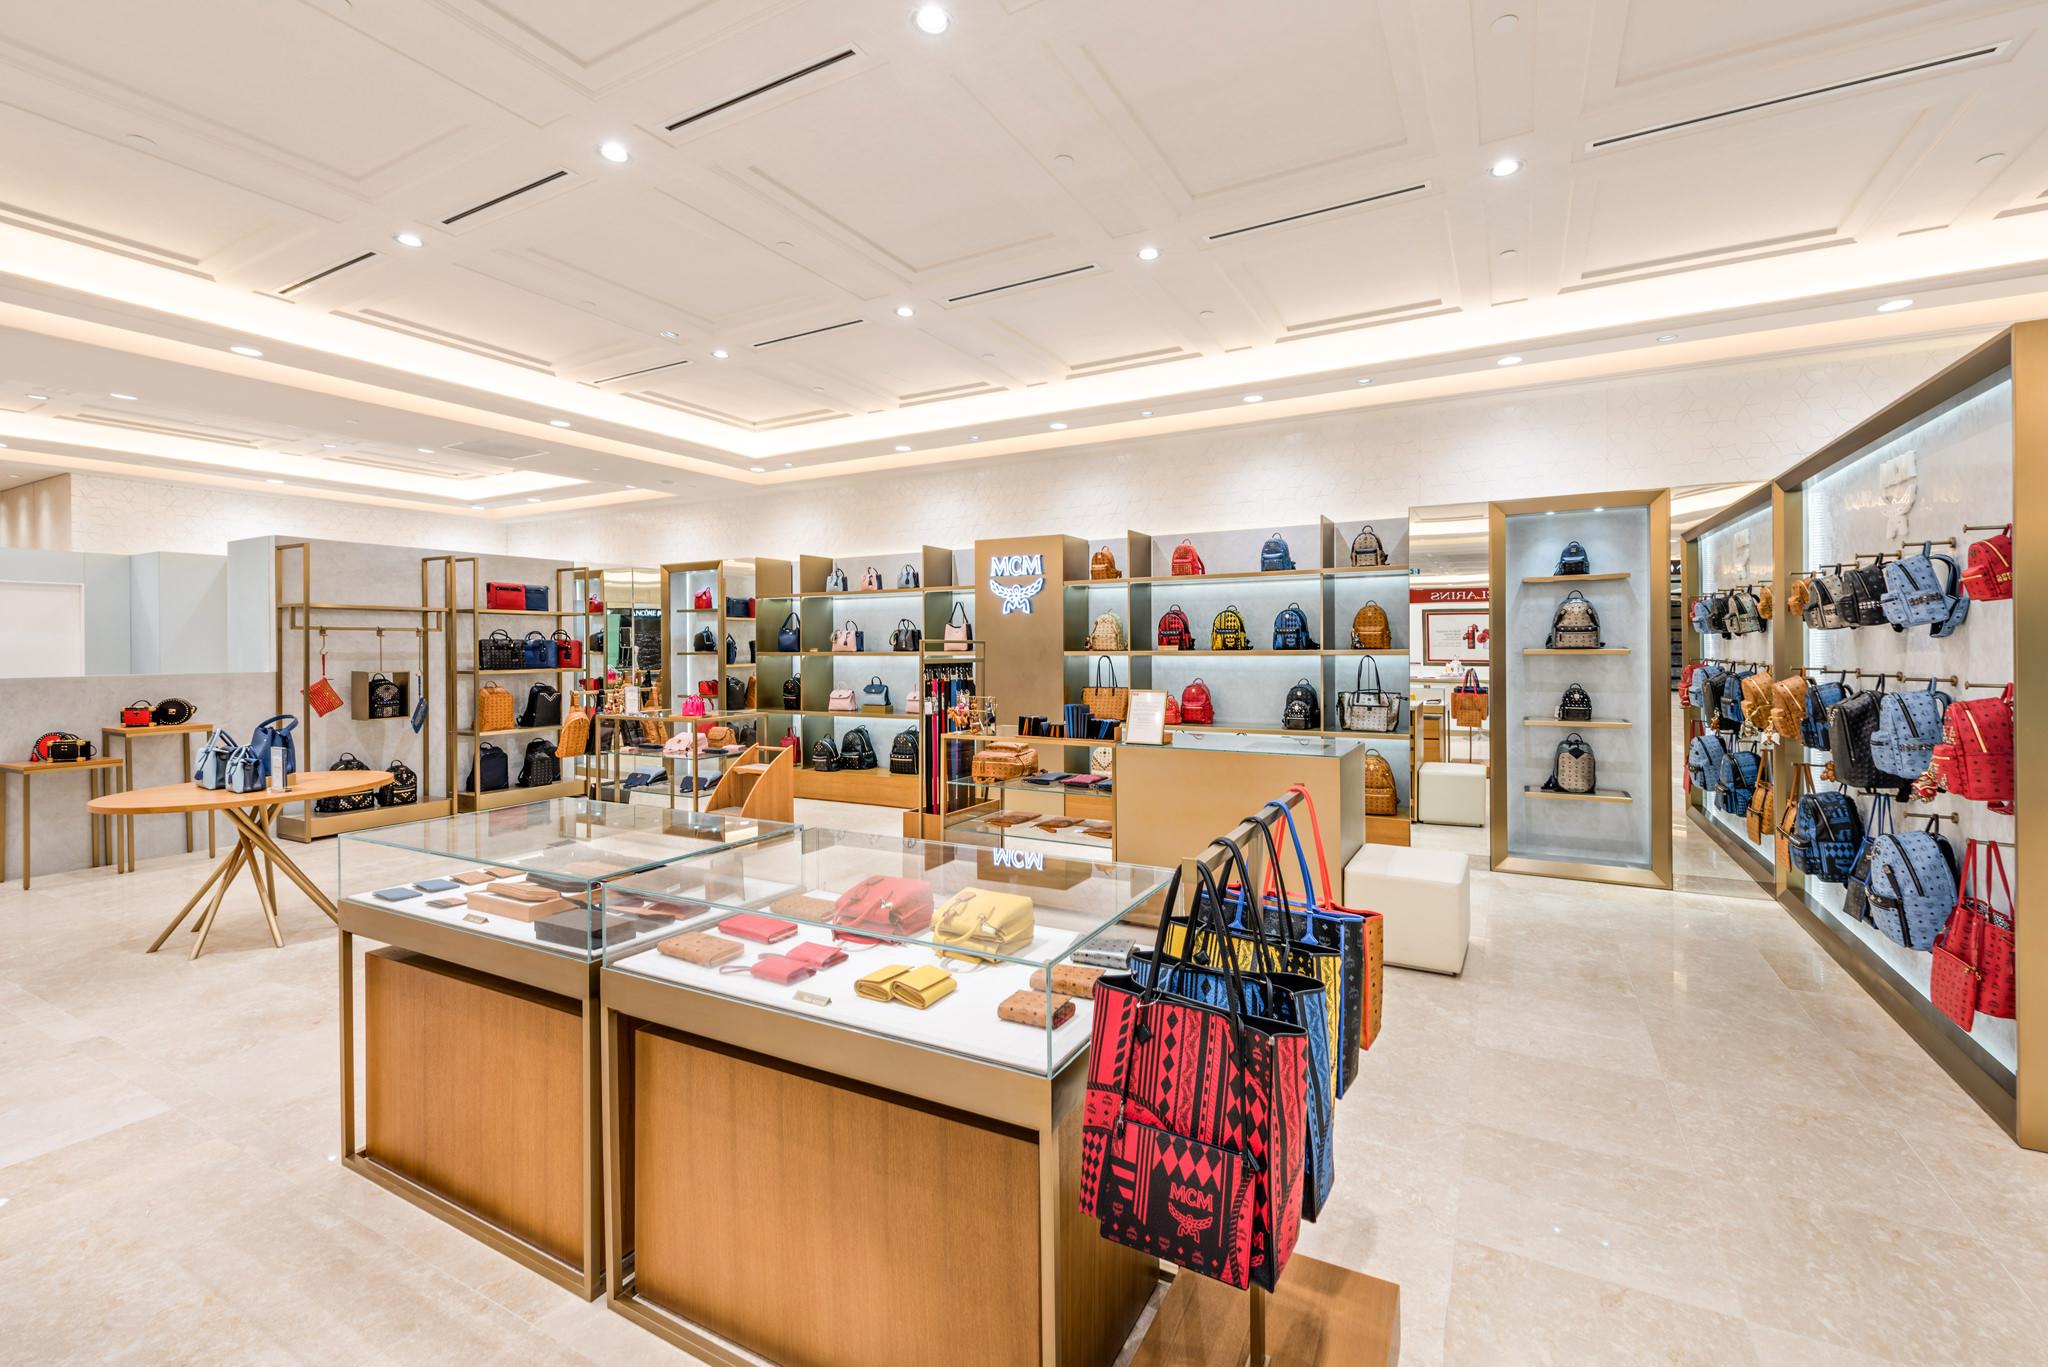 20160729 - MCM - HCM - Commercial - Interior - Store - Retouch 0001.jpg